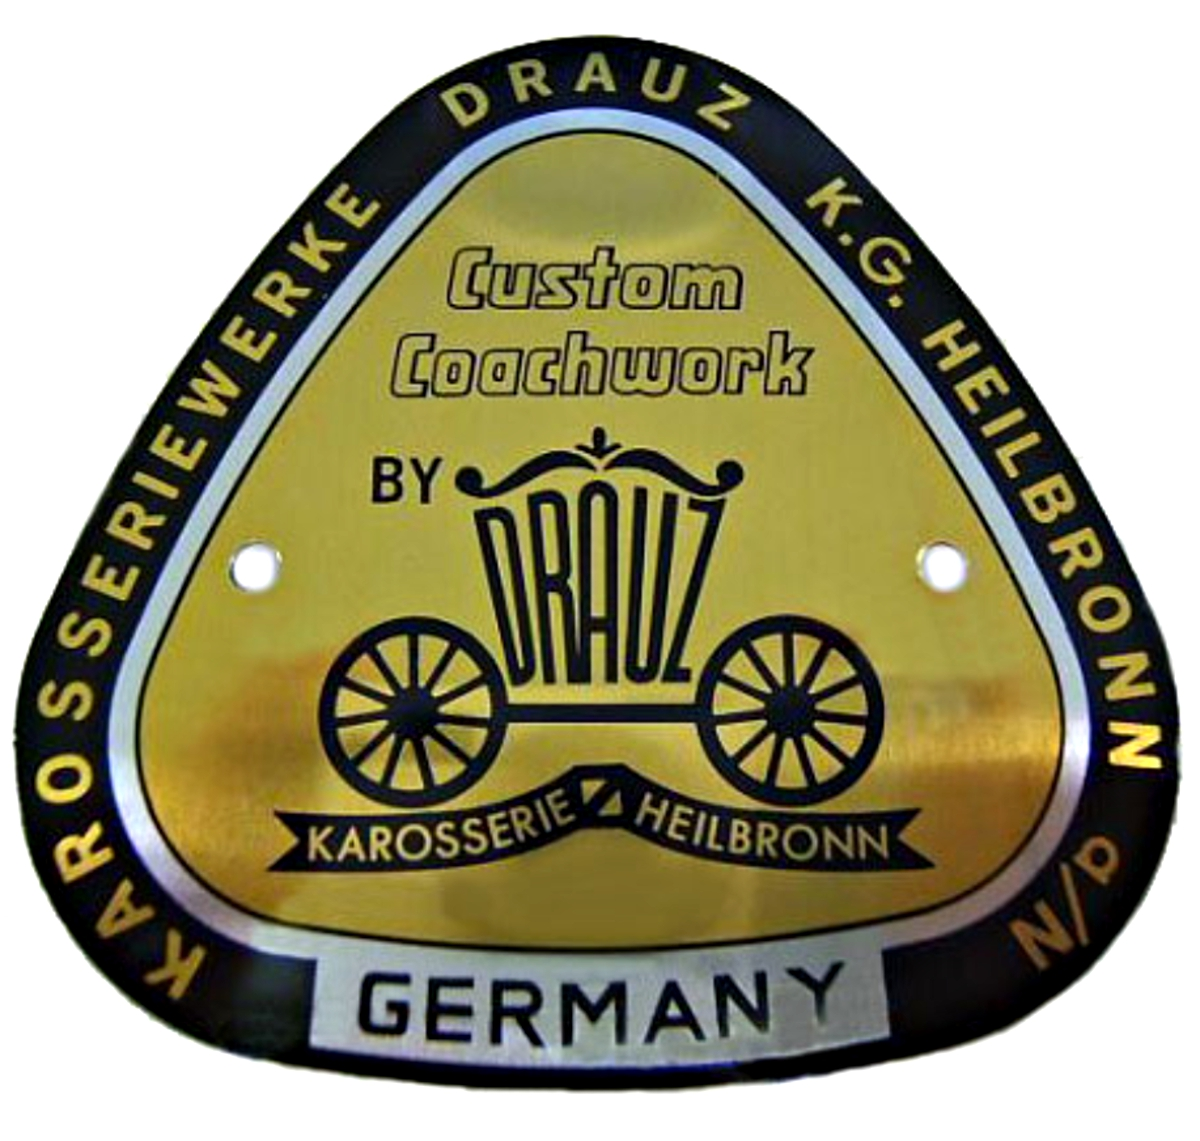 Drauz convertible and roadster badge